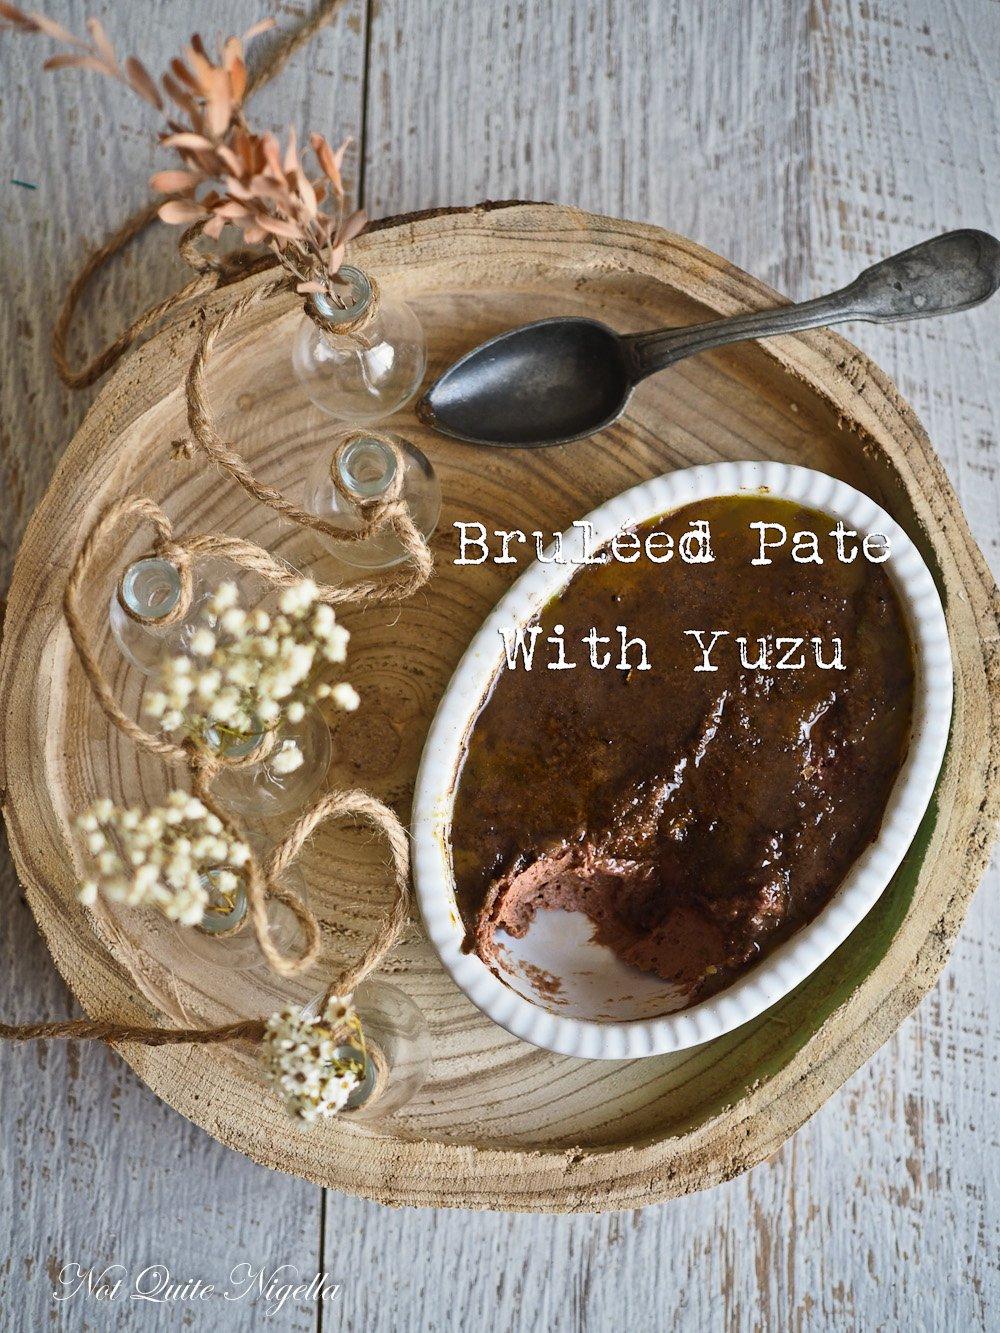 Bruleed pate with yuzu